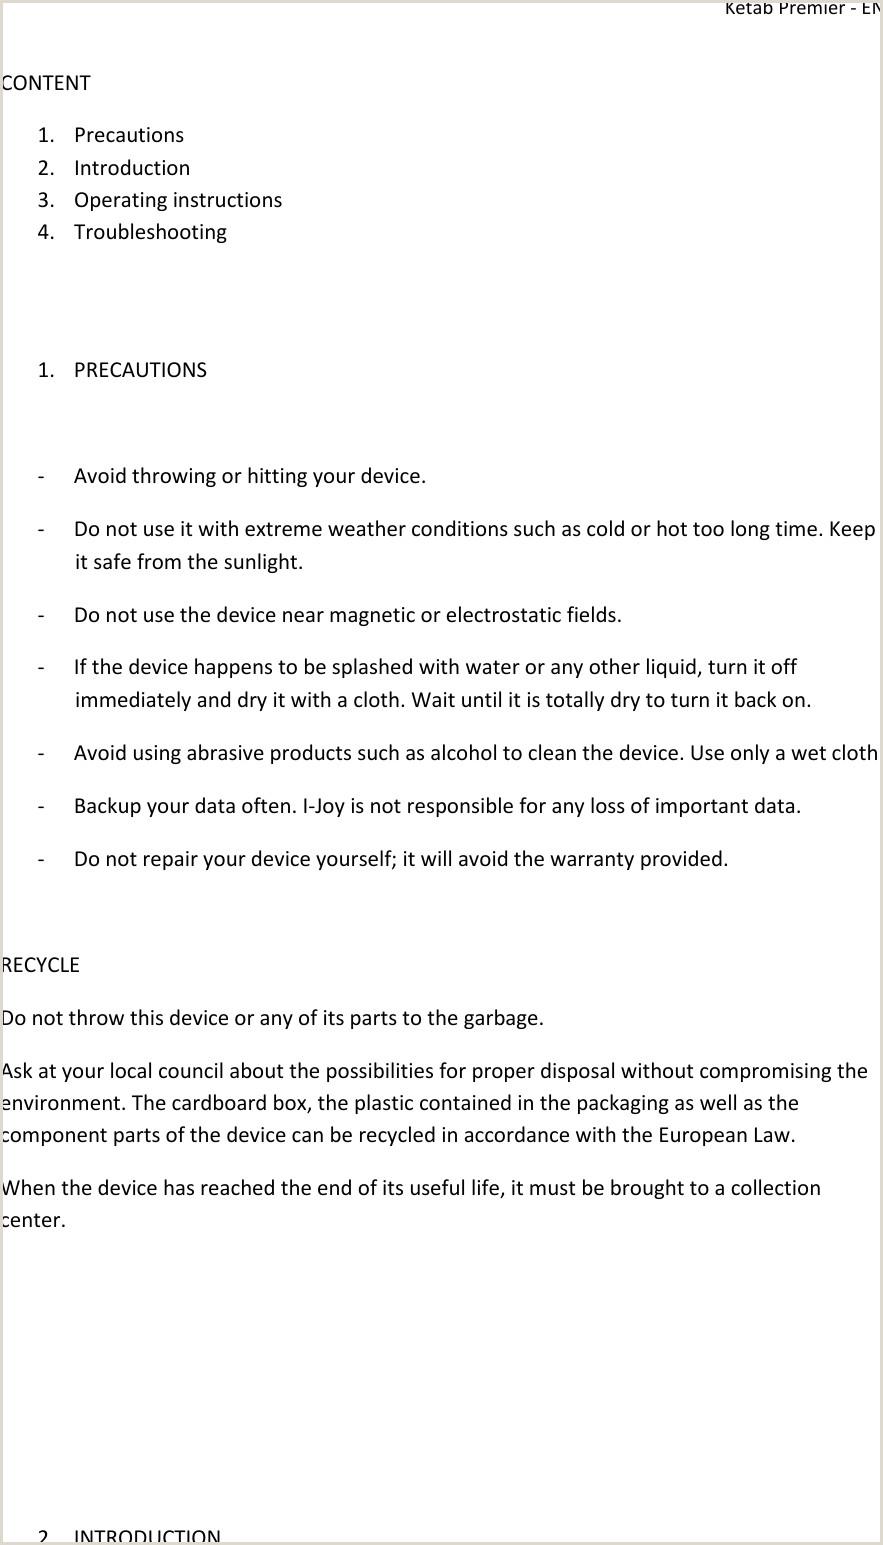 I Joy Ketab Premier Operating Instructions